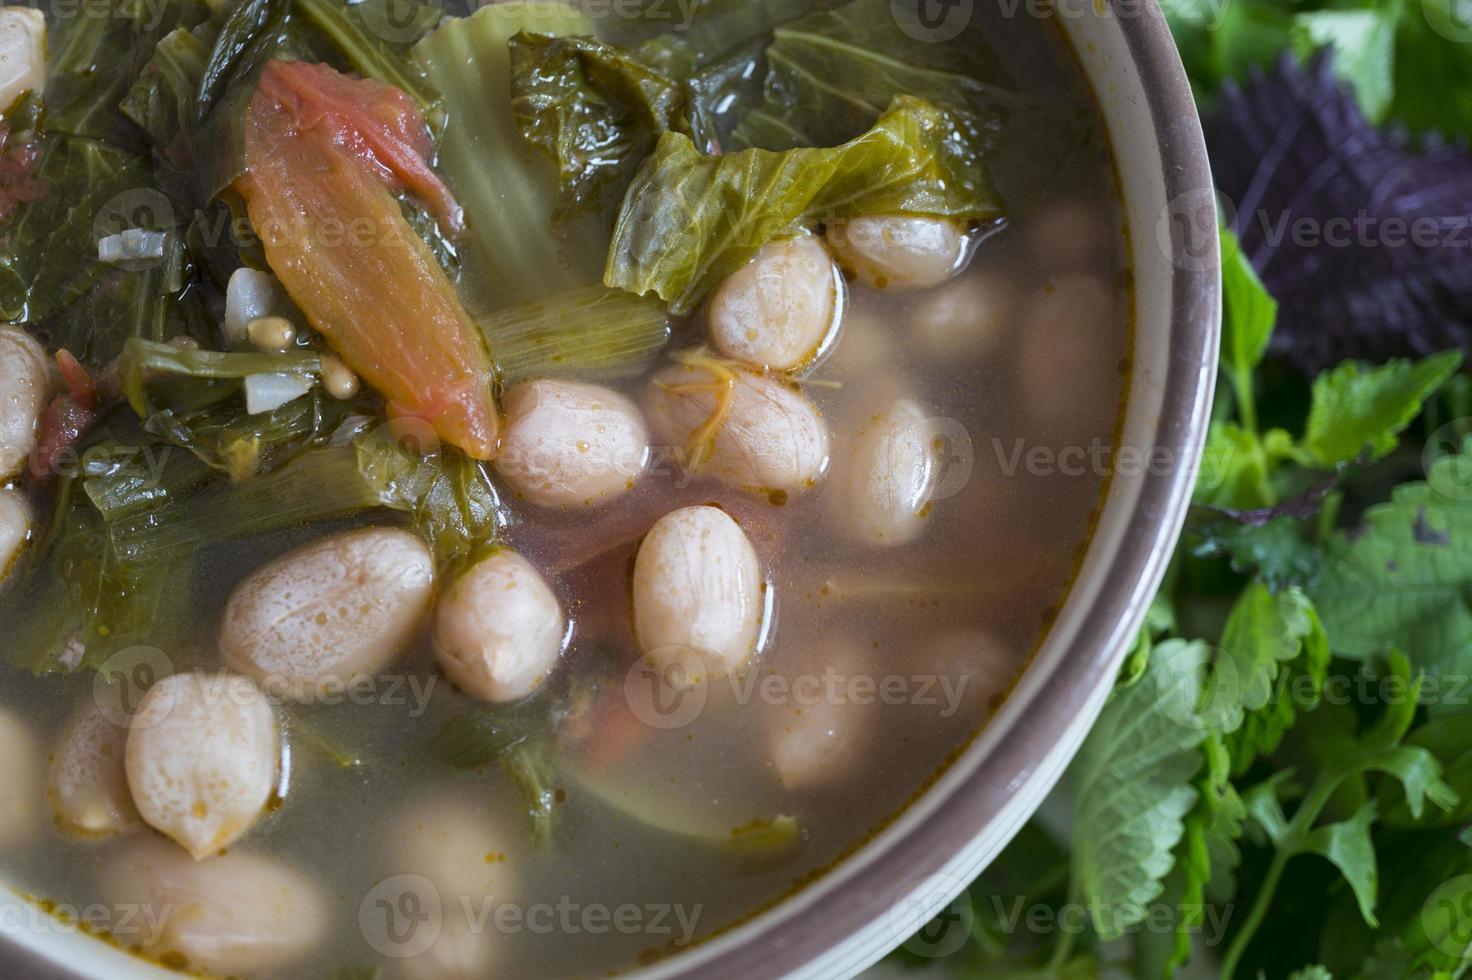 Pickles soup - Vegan food photo